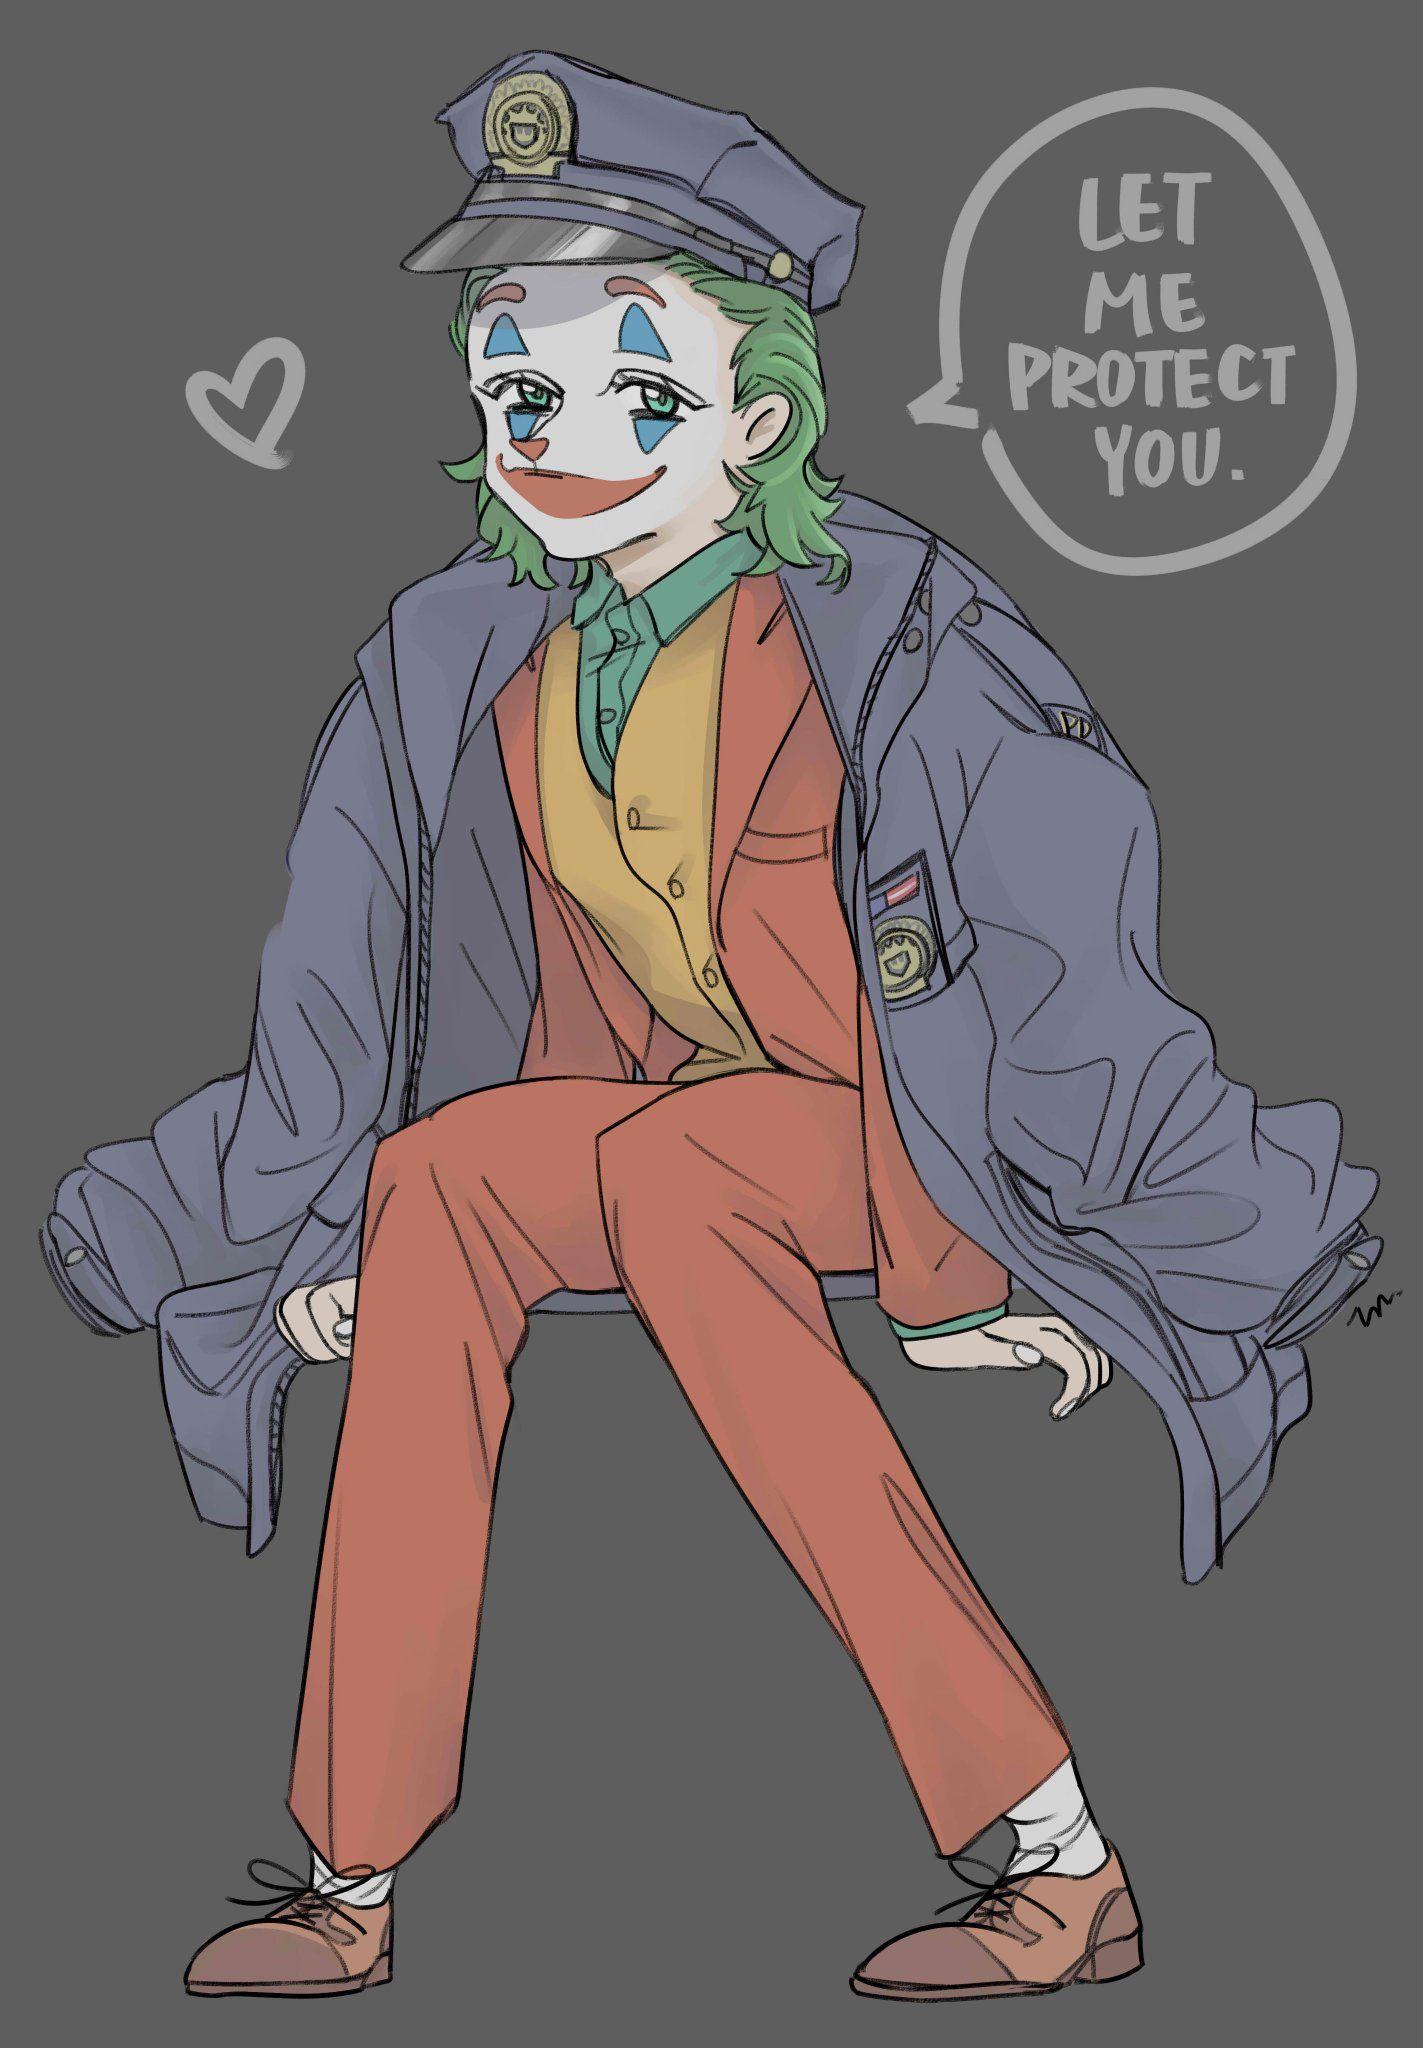 Joker art image by 喬依 黃 on 雜 Persona 5 anime, Joker